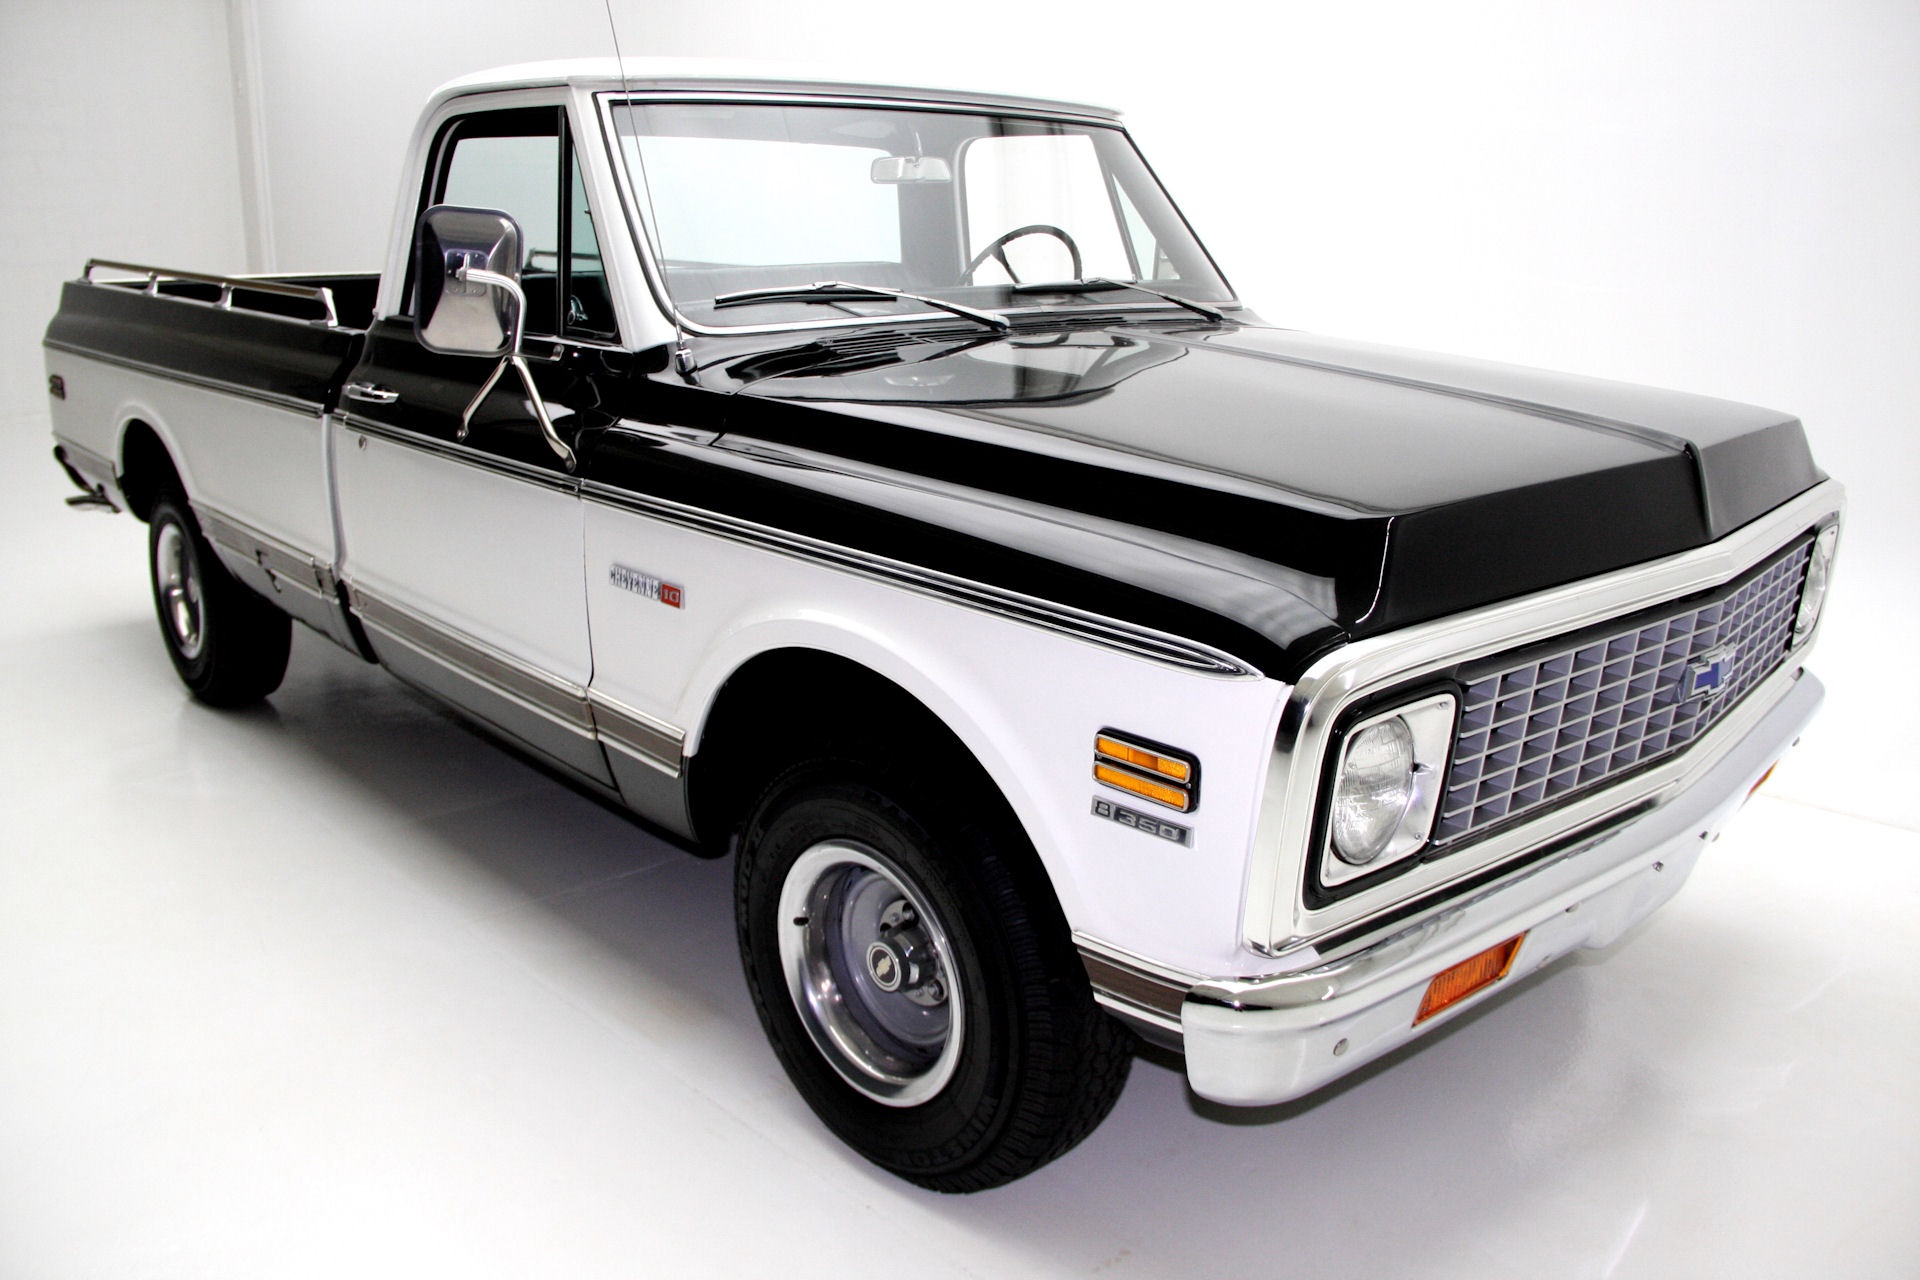 hight resolution of 1971 chevrolet cheyenne c10 pickup black factory ac